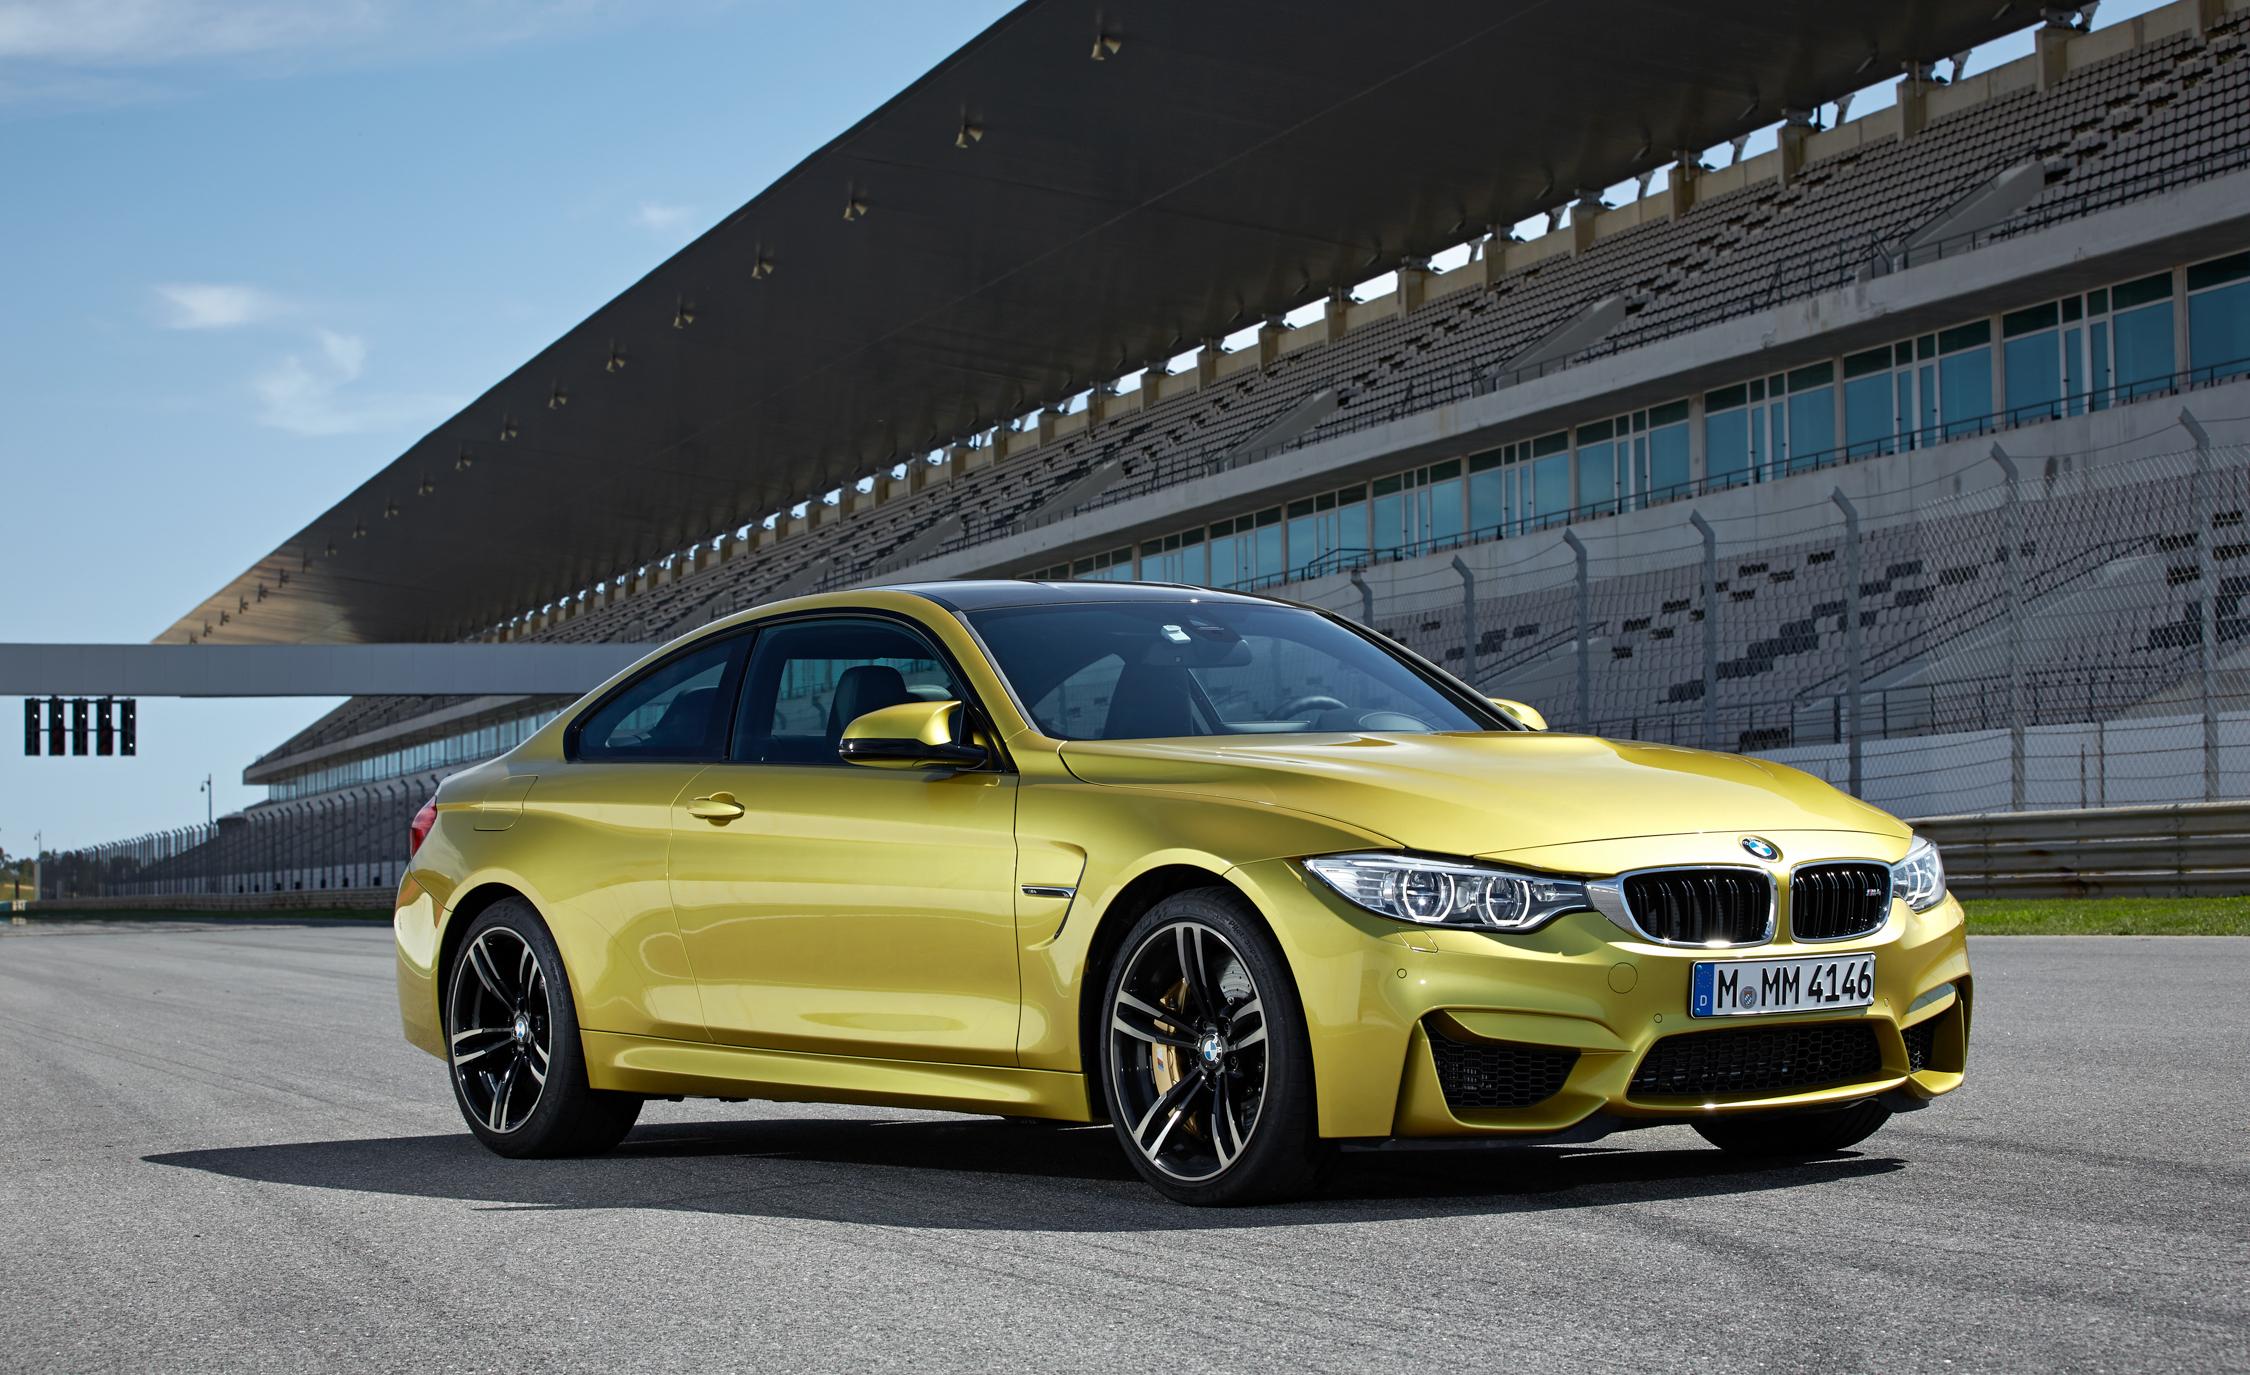 2015 BMW M4 Coupe Exterior